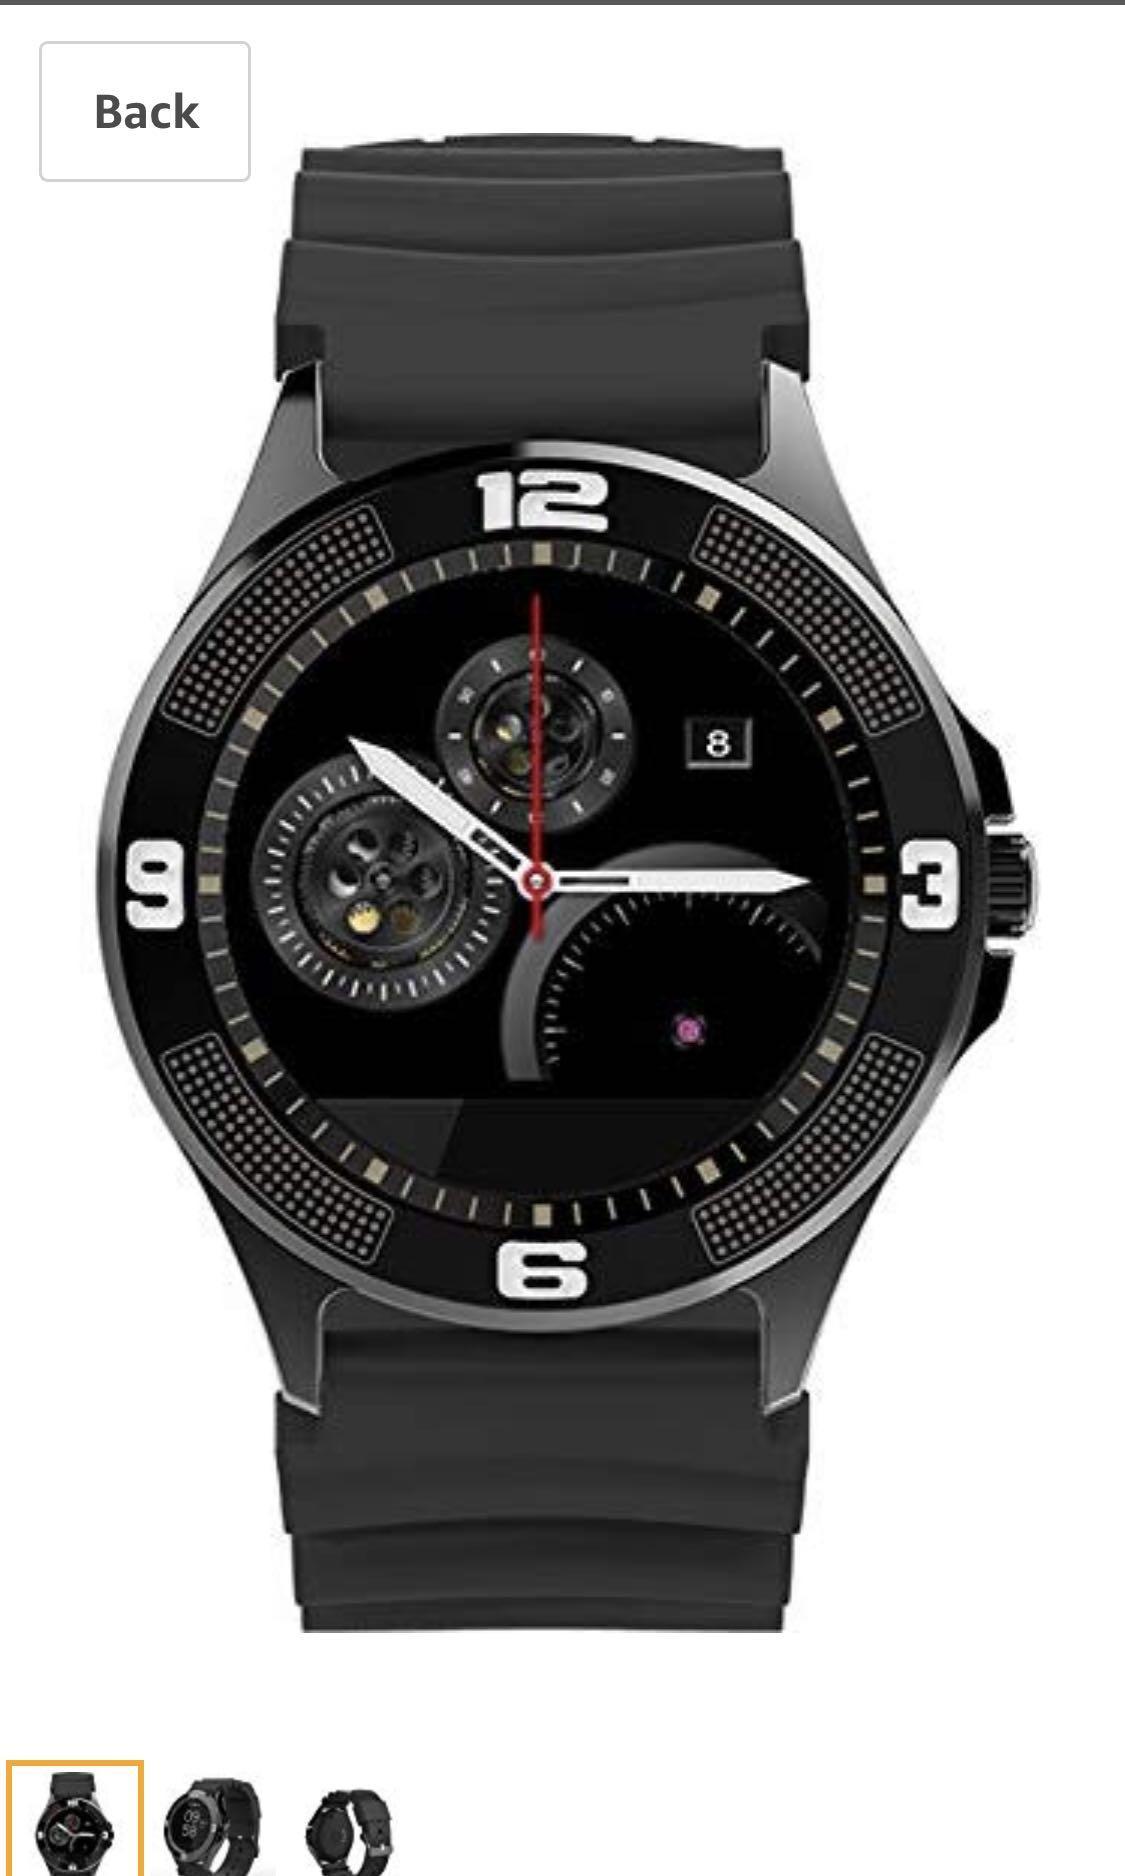 PRIXTON smart watch SW14 - phone call bluetooth heart rate sleep monitor